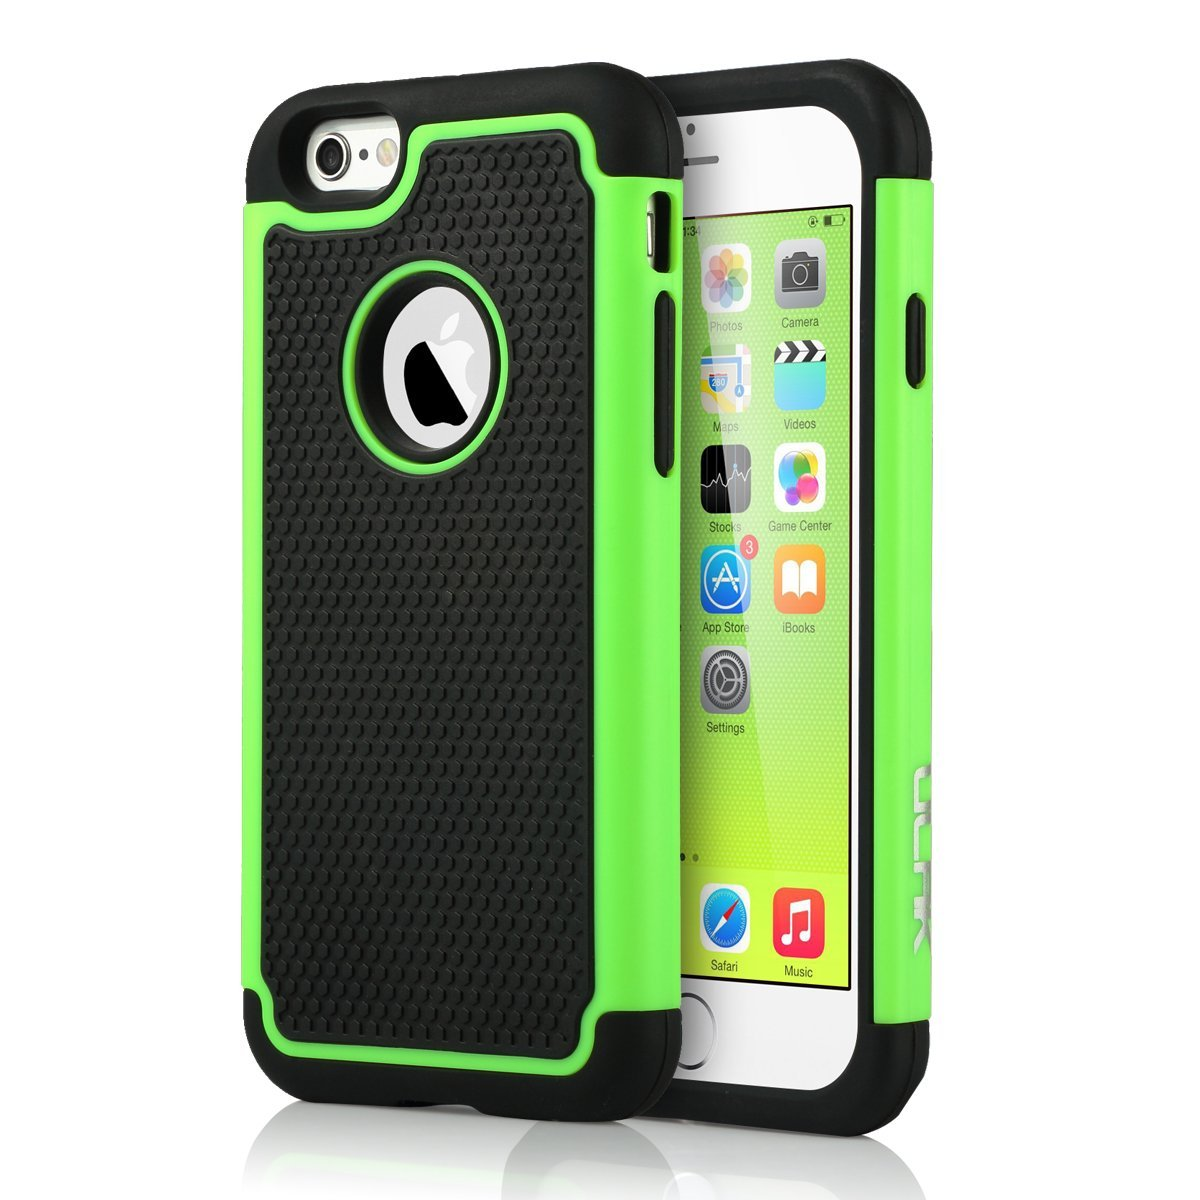 rugged rubber hard shockproof cover case for apple iphone. Black Bedroom Furniture Sets. Home Design Ideas